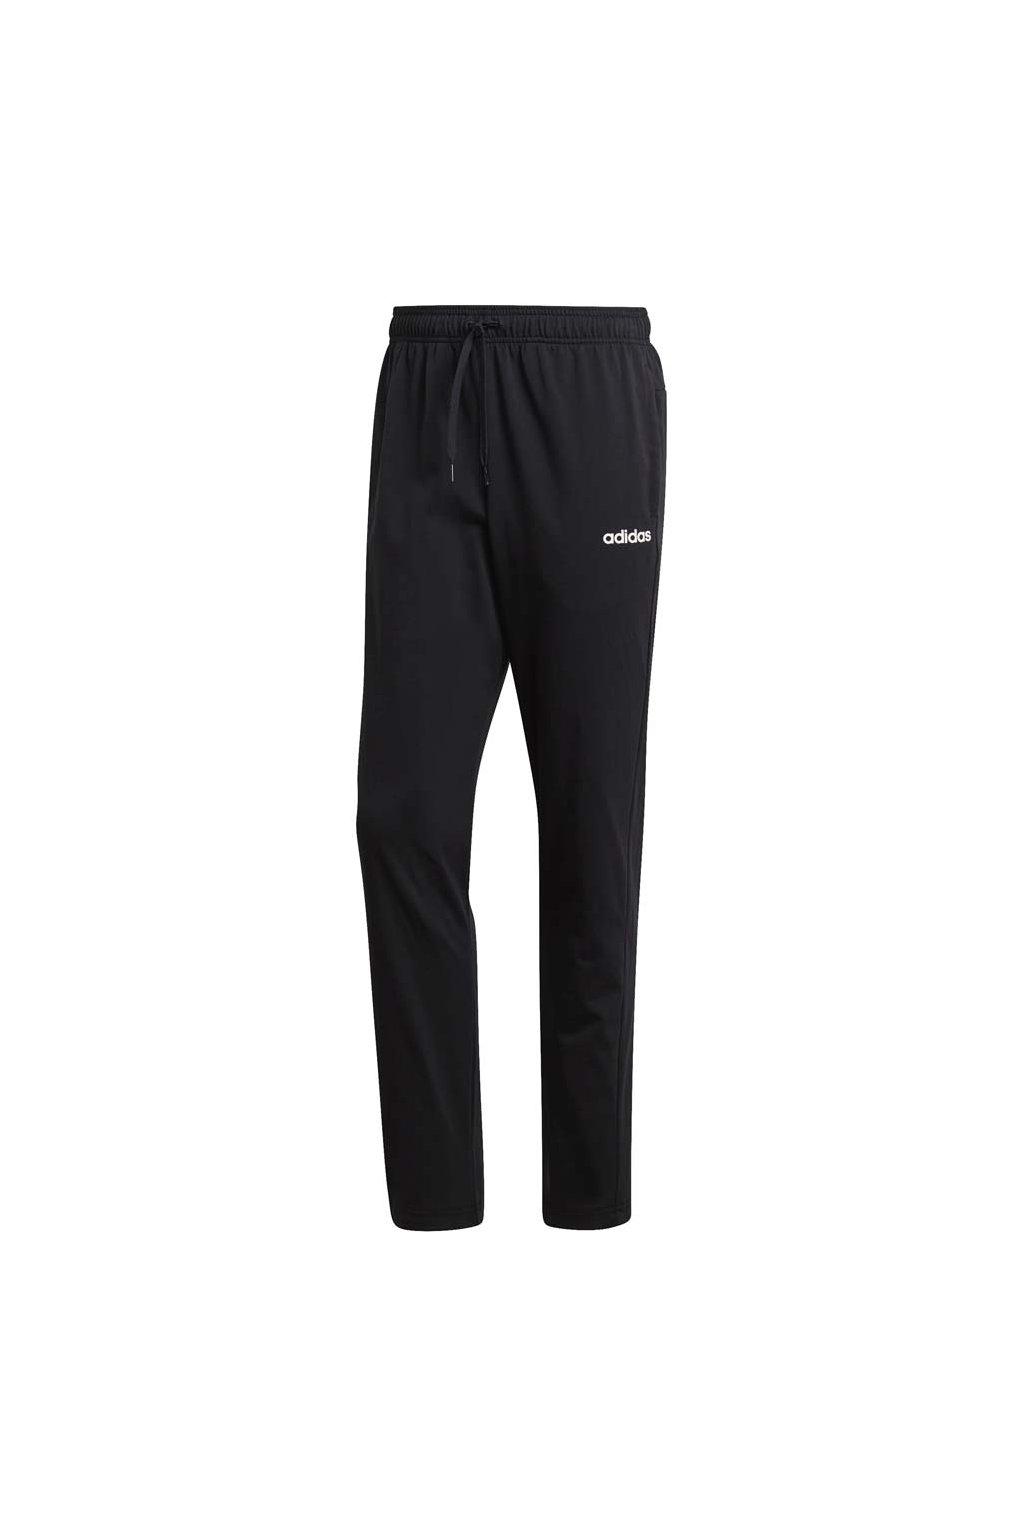 Pánske tepláky adidas Essentials Plain Tapered Pant SJ čierne DU0378